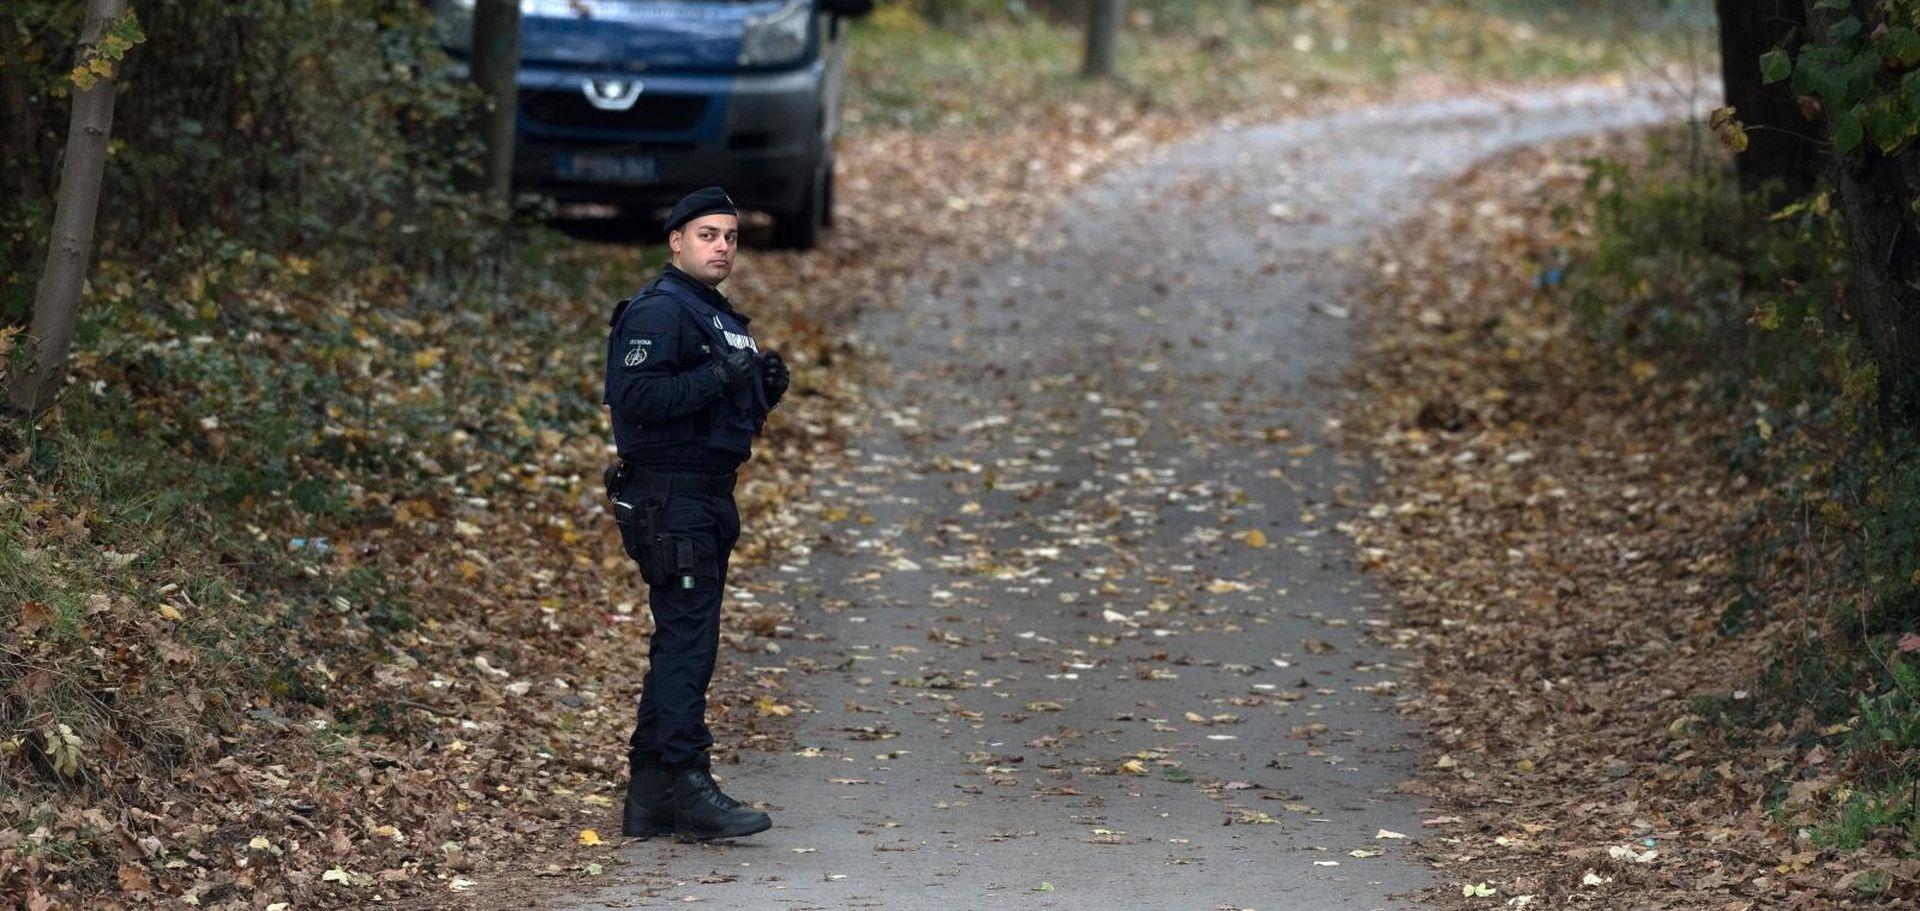 UBIJEN GREŠKOM? Likvidiran muškarac u Beogradu